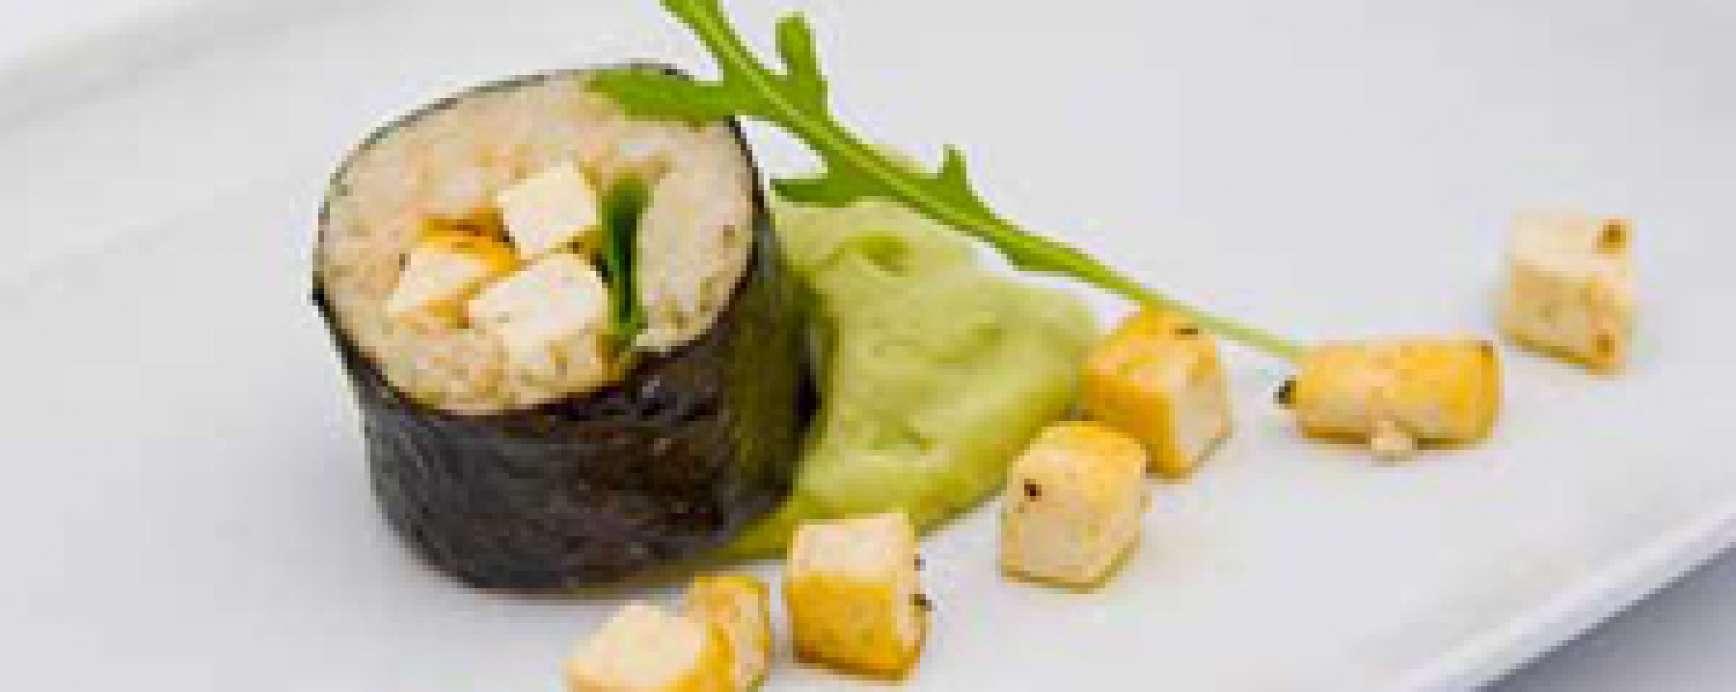 Cauliflower and bulgur sushi with spicy tofu and avocado-wasabi dip